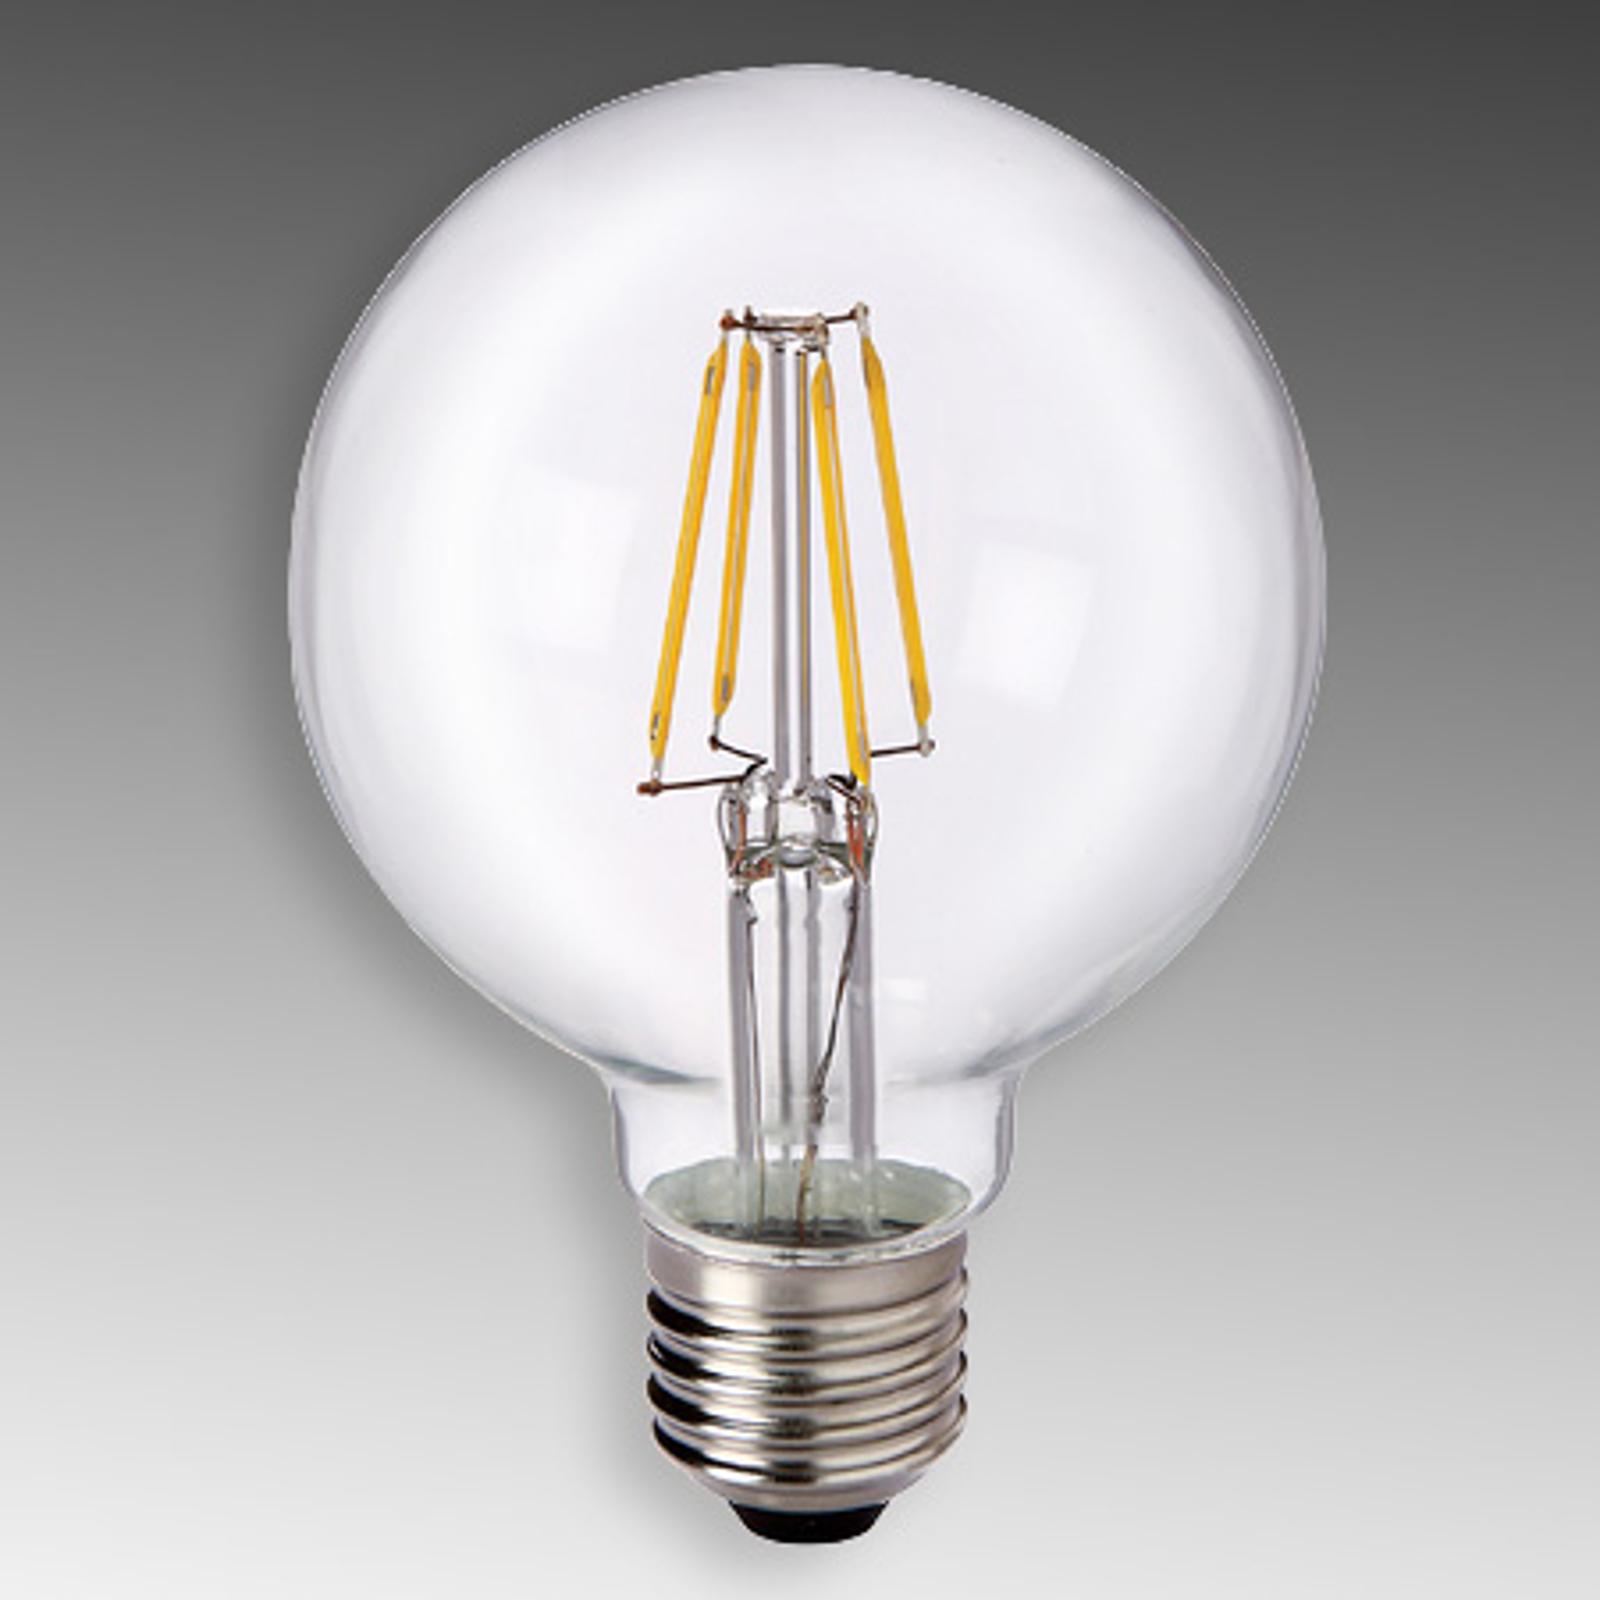 LED-Globelampe E27 6W 827 G80 Filament klar